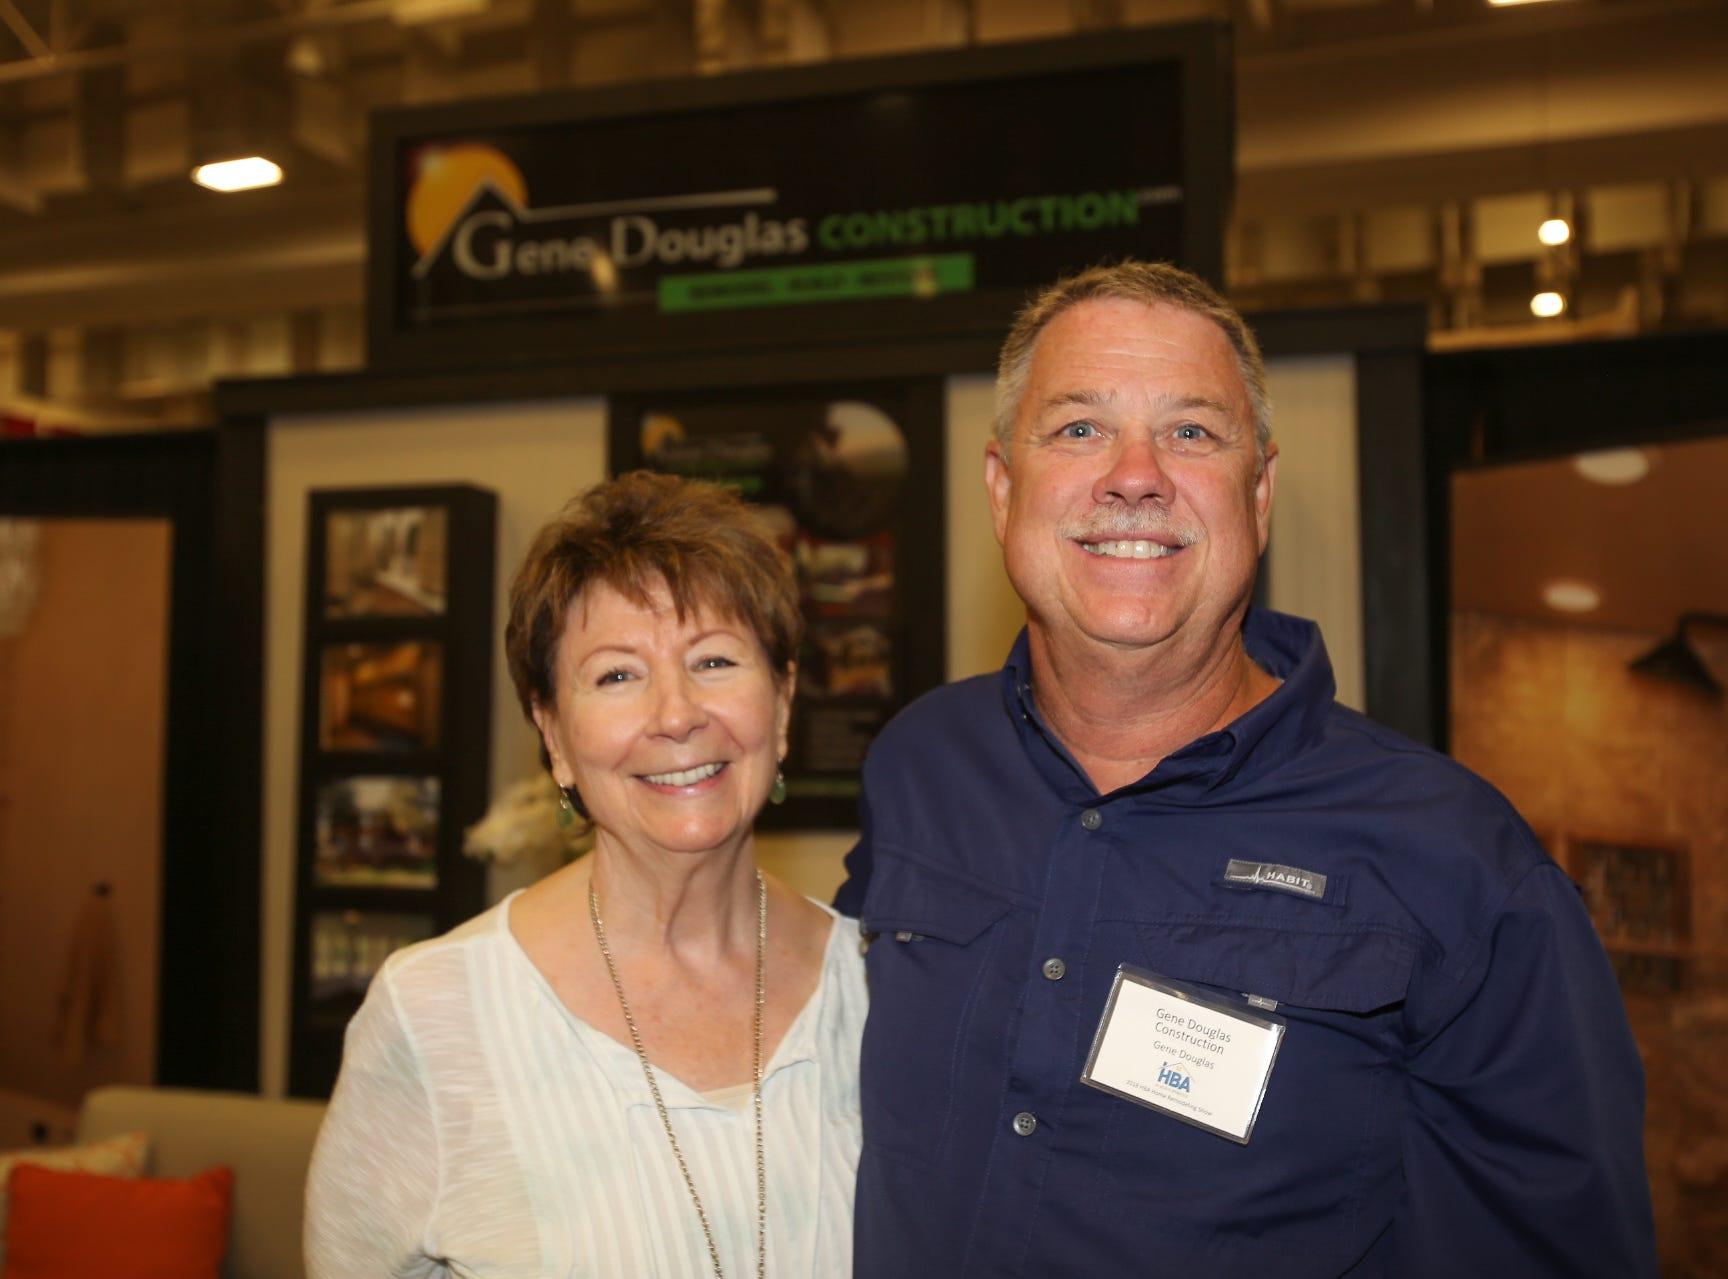 Maria and Gene Douglas